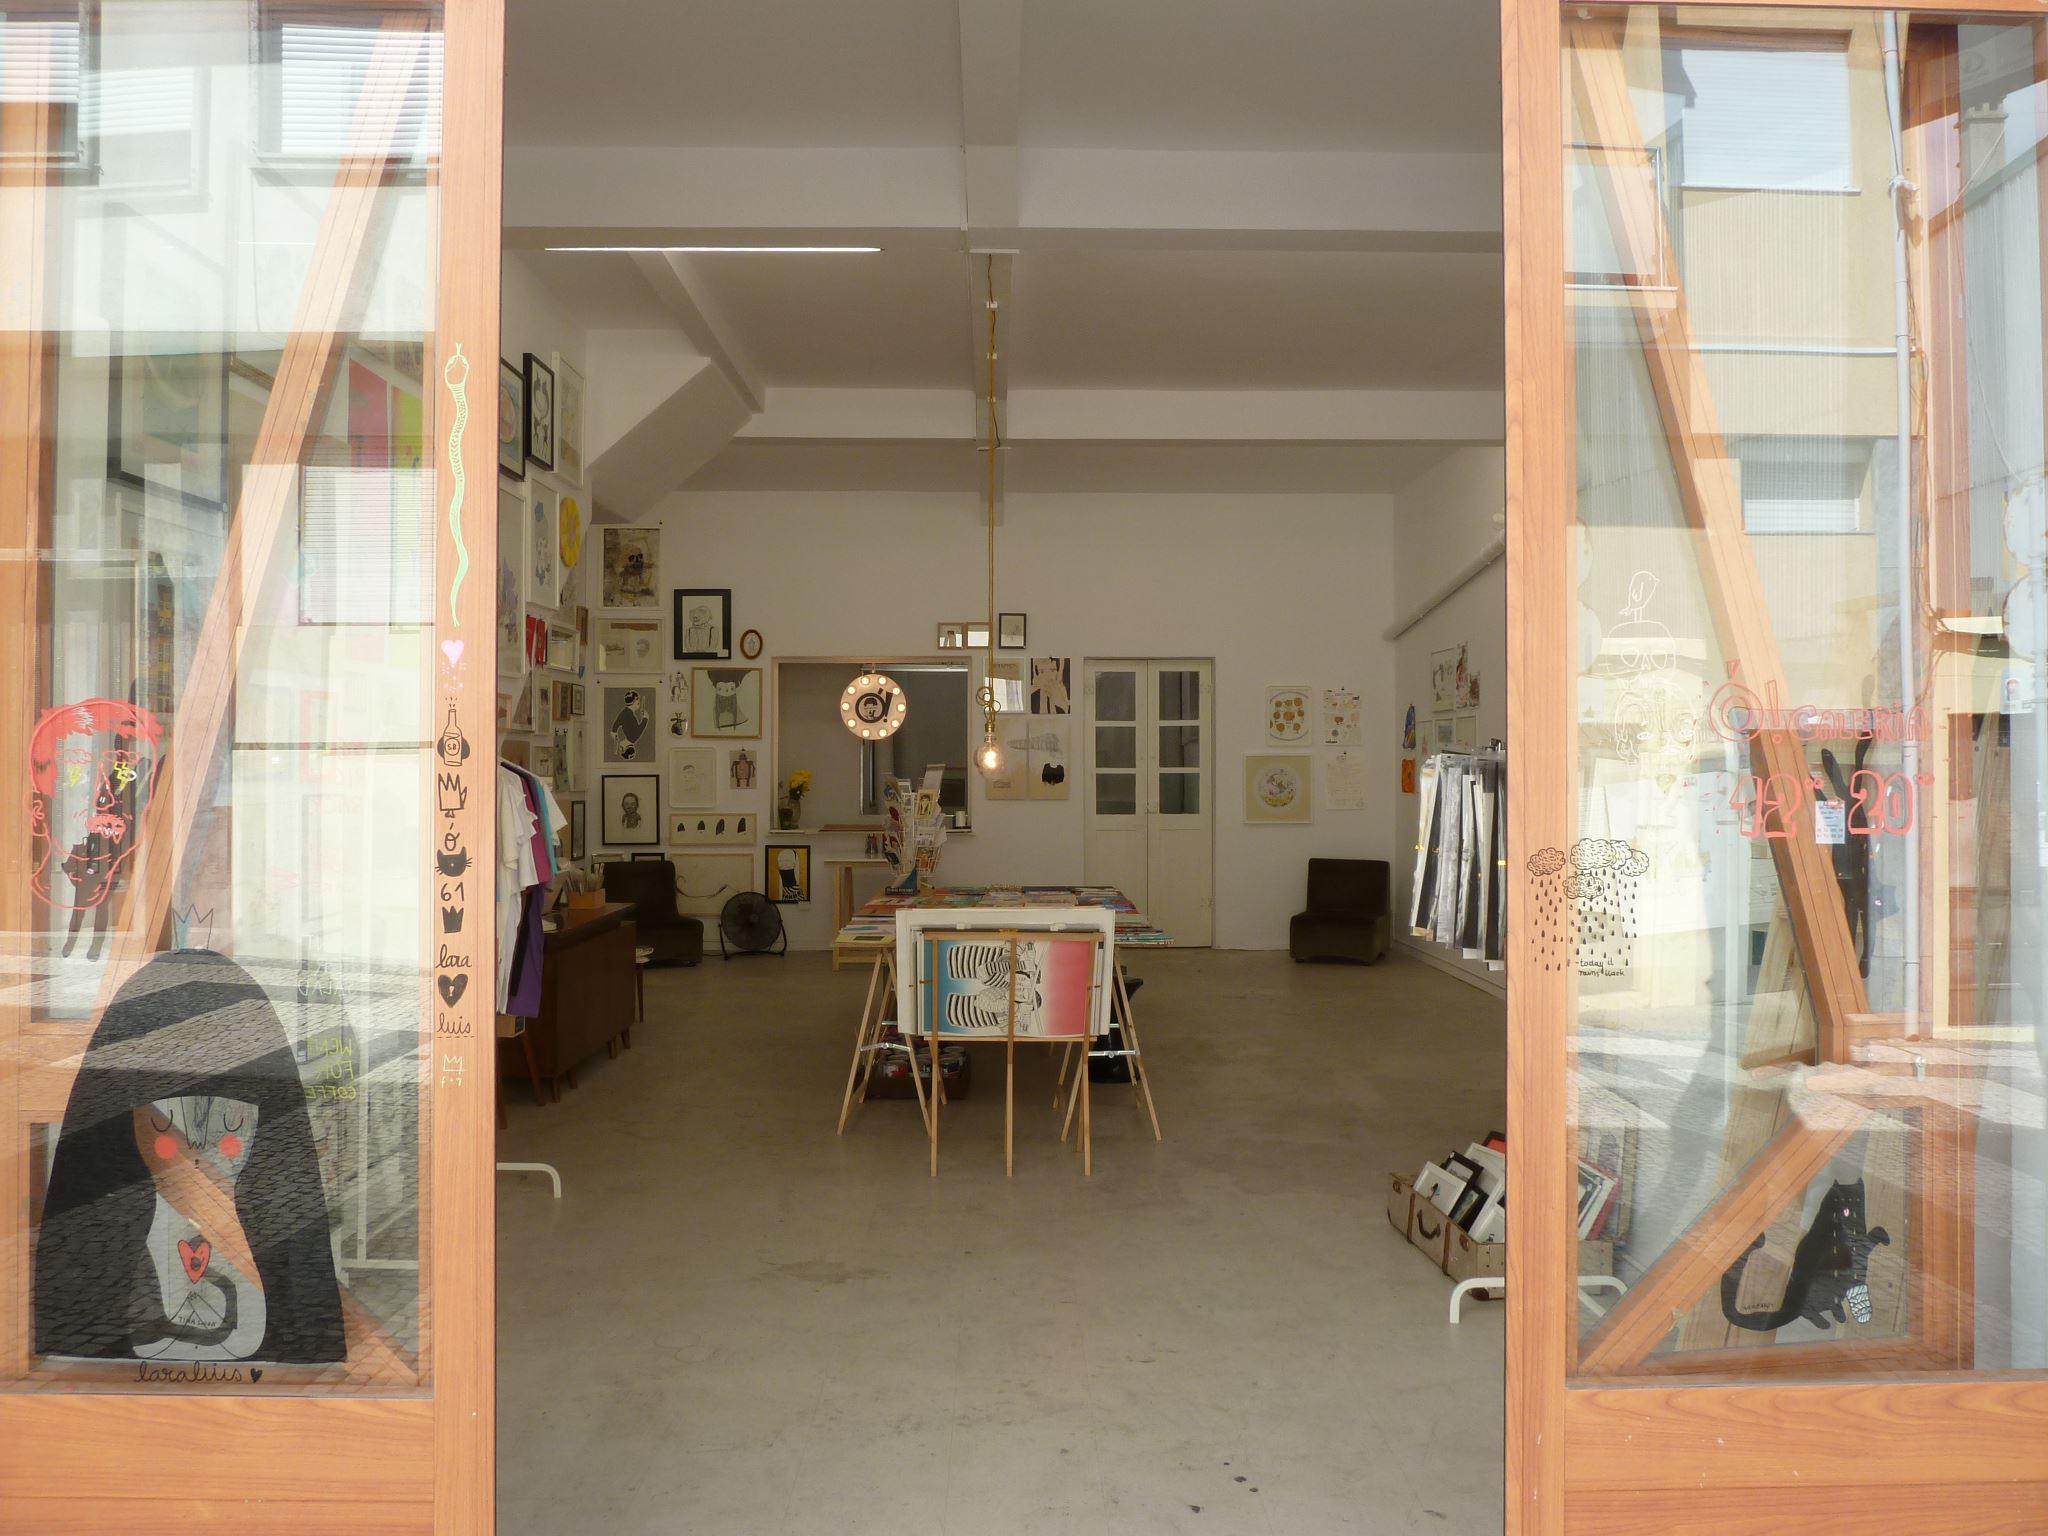 Boutique et galerie art - O Galeria - rue Miguel Bombarda - Porto